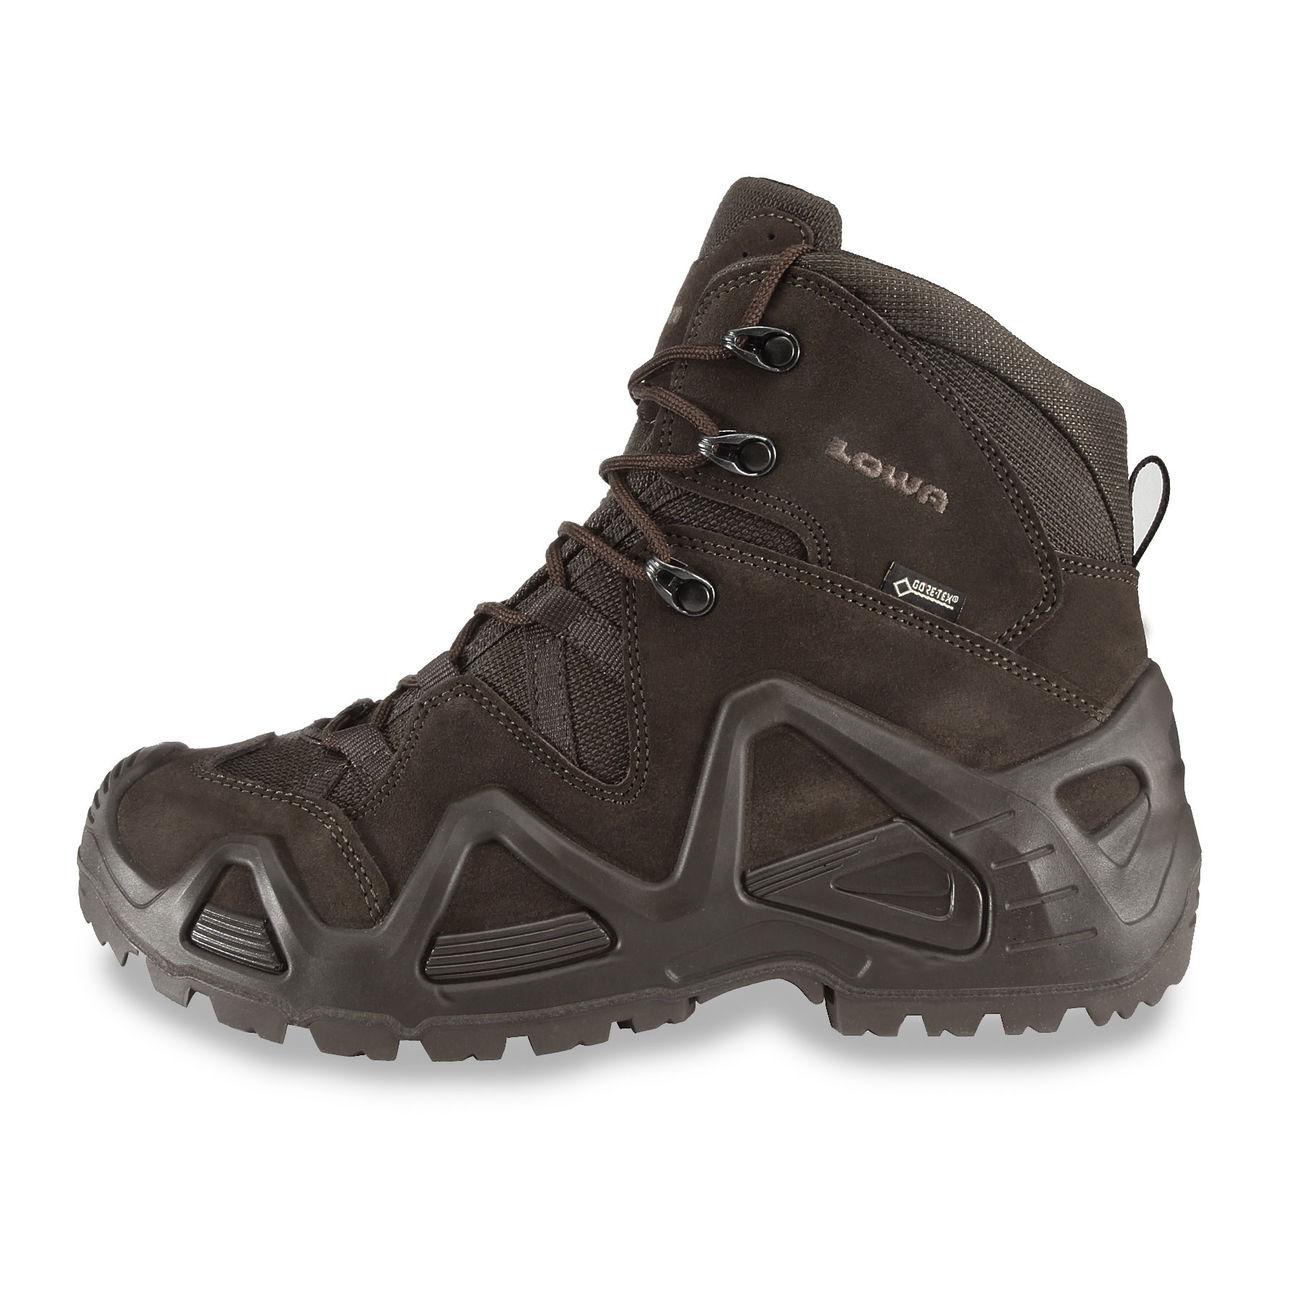 Lowa Boots Zephyr GTX MID TF dunkelbraun